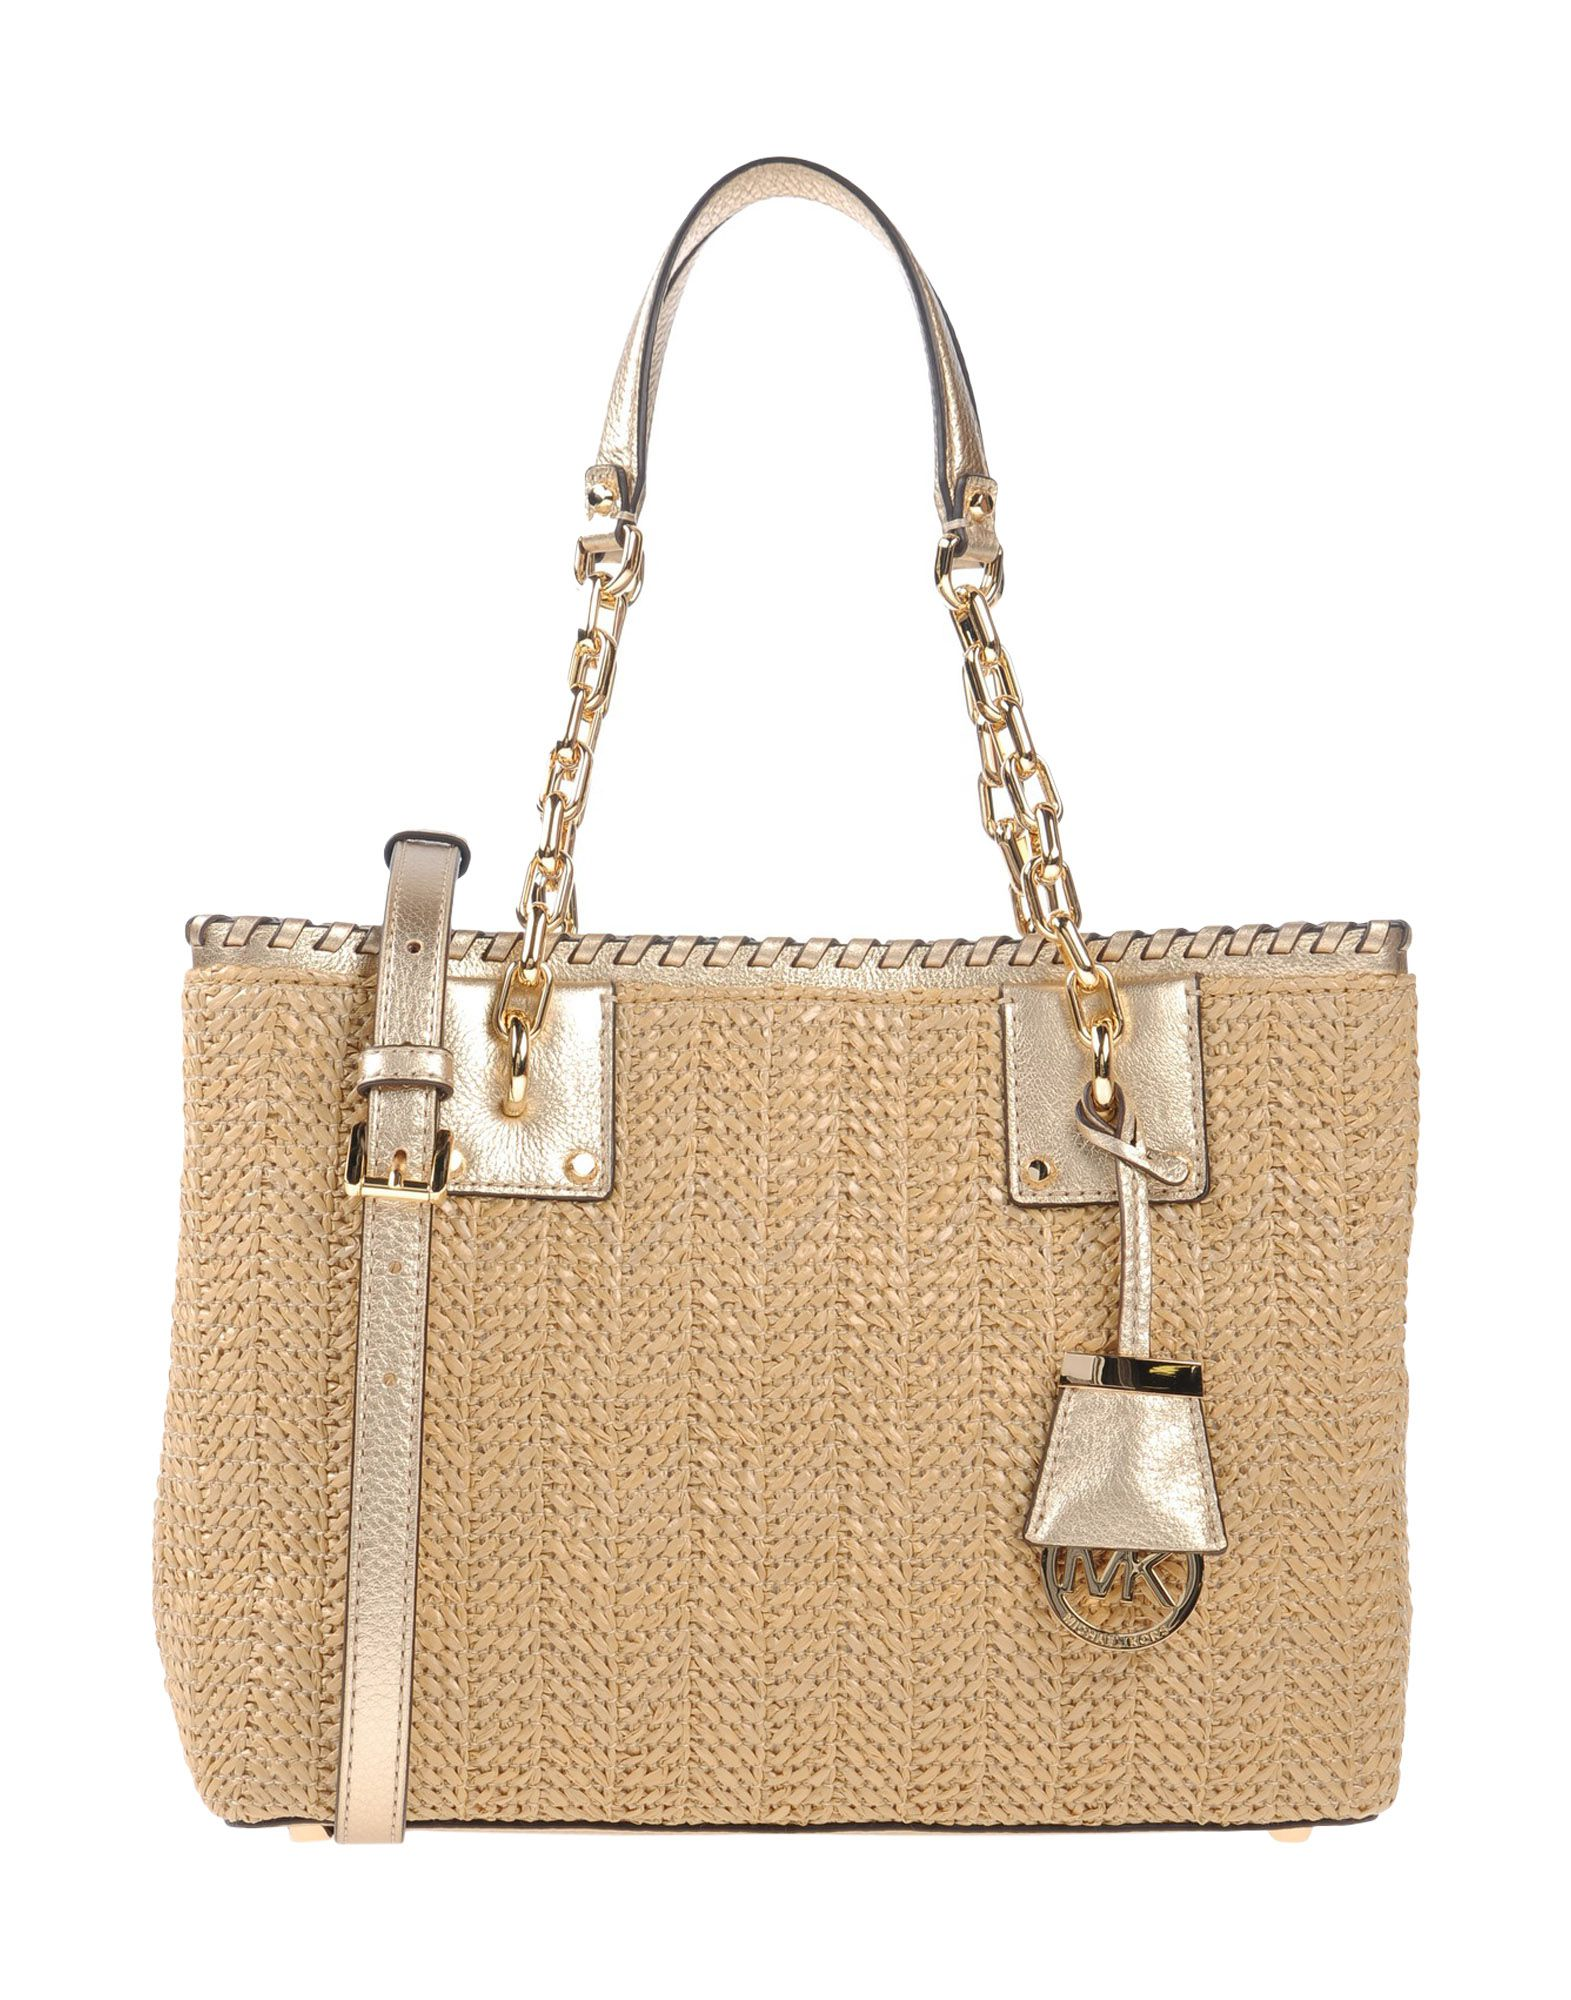 michael kors female michael kors handbags